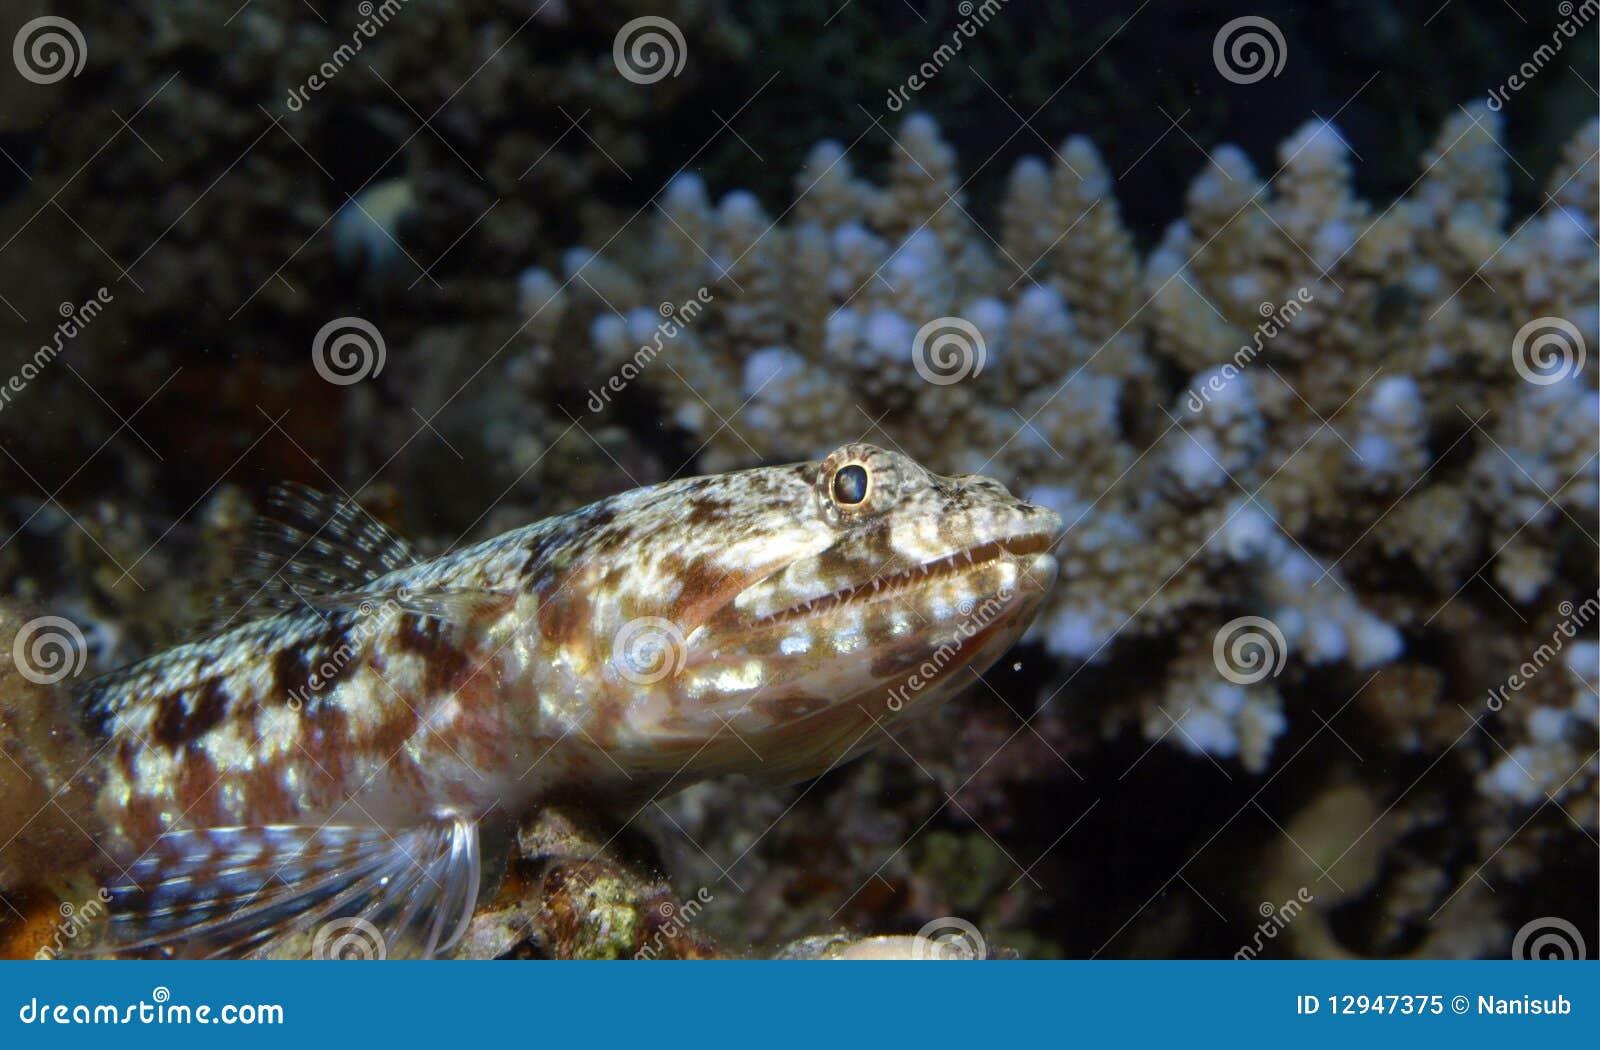 Lizard fish royalty free stock photo image 12947375 for Water lizard fish